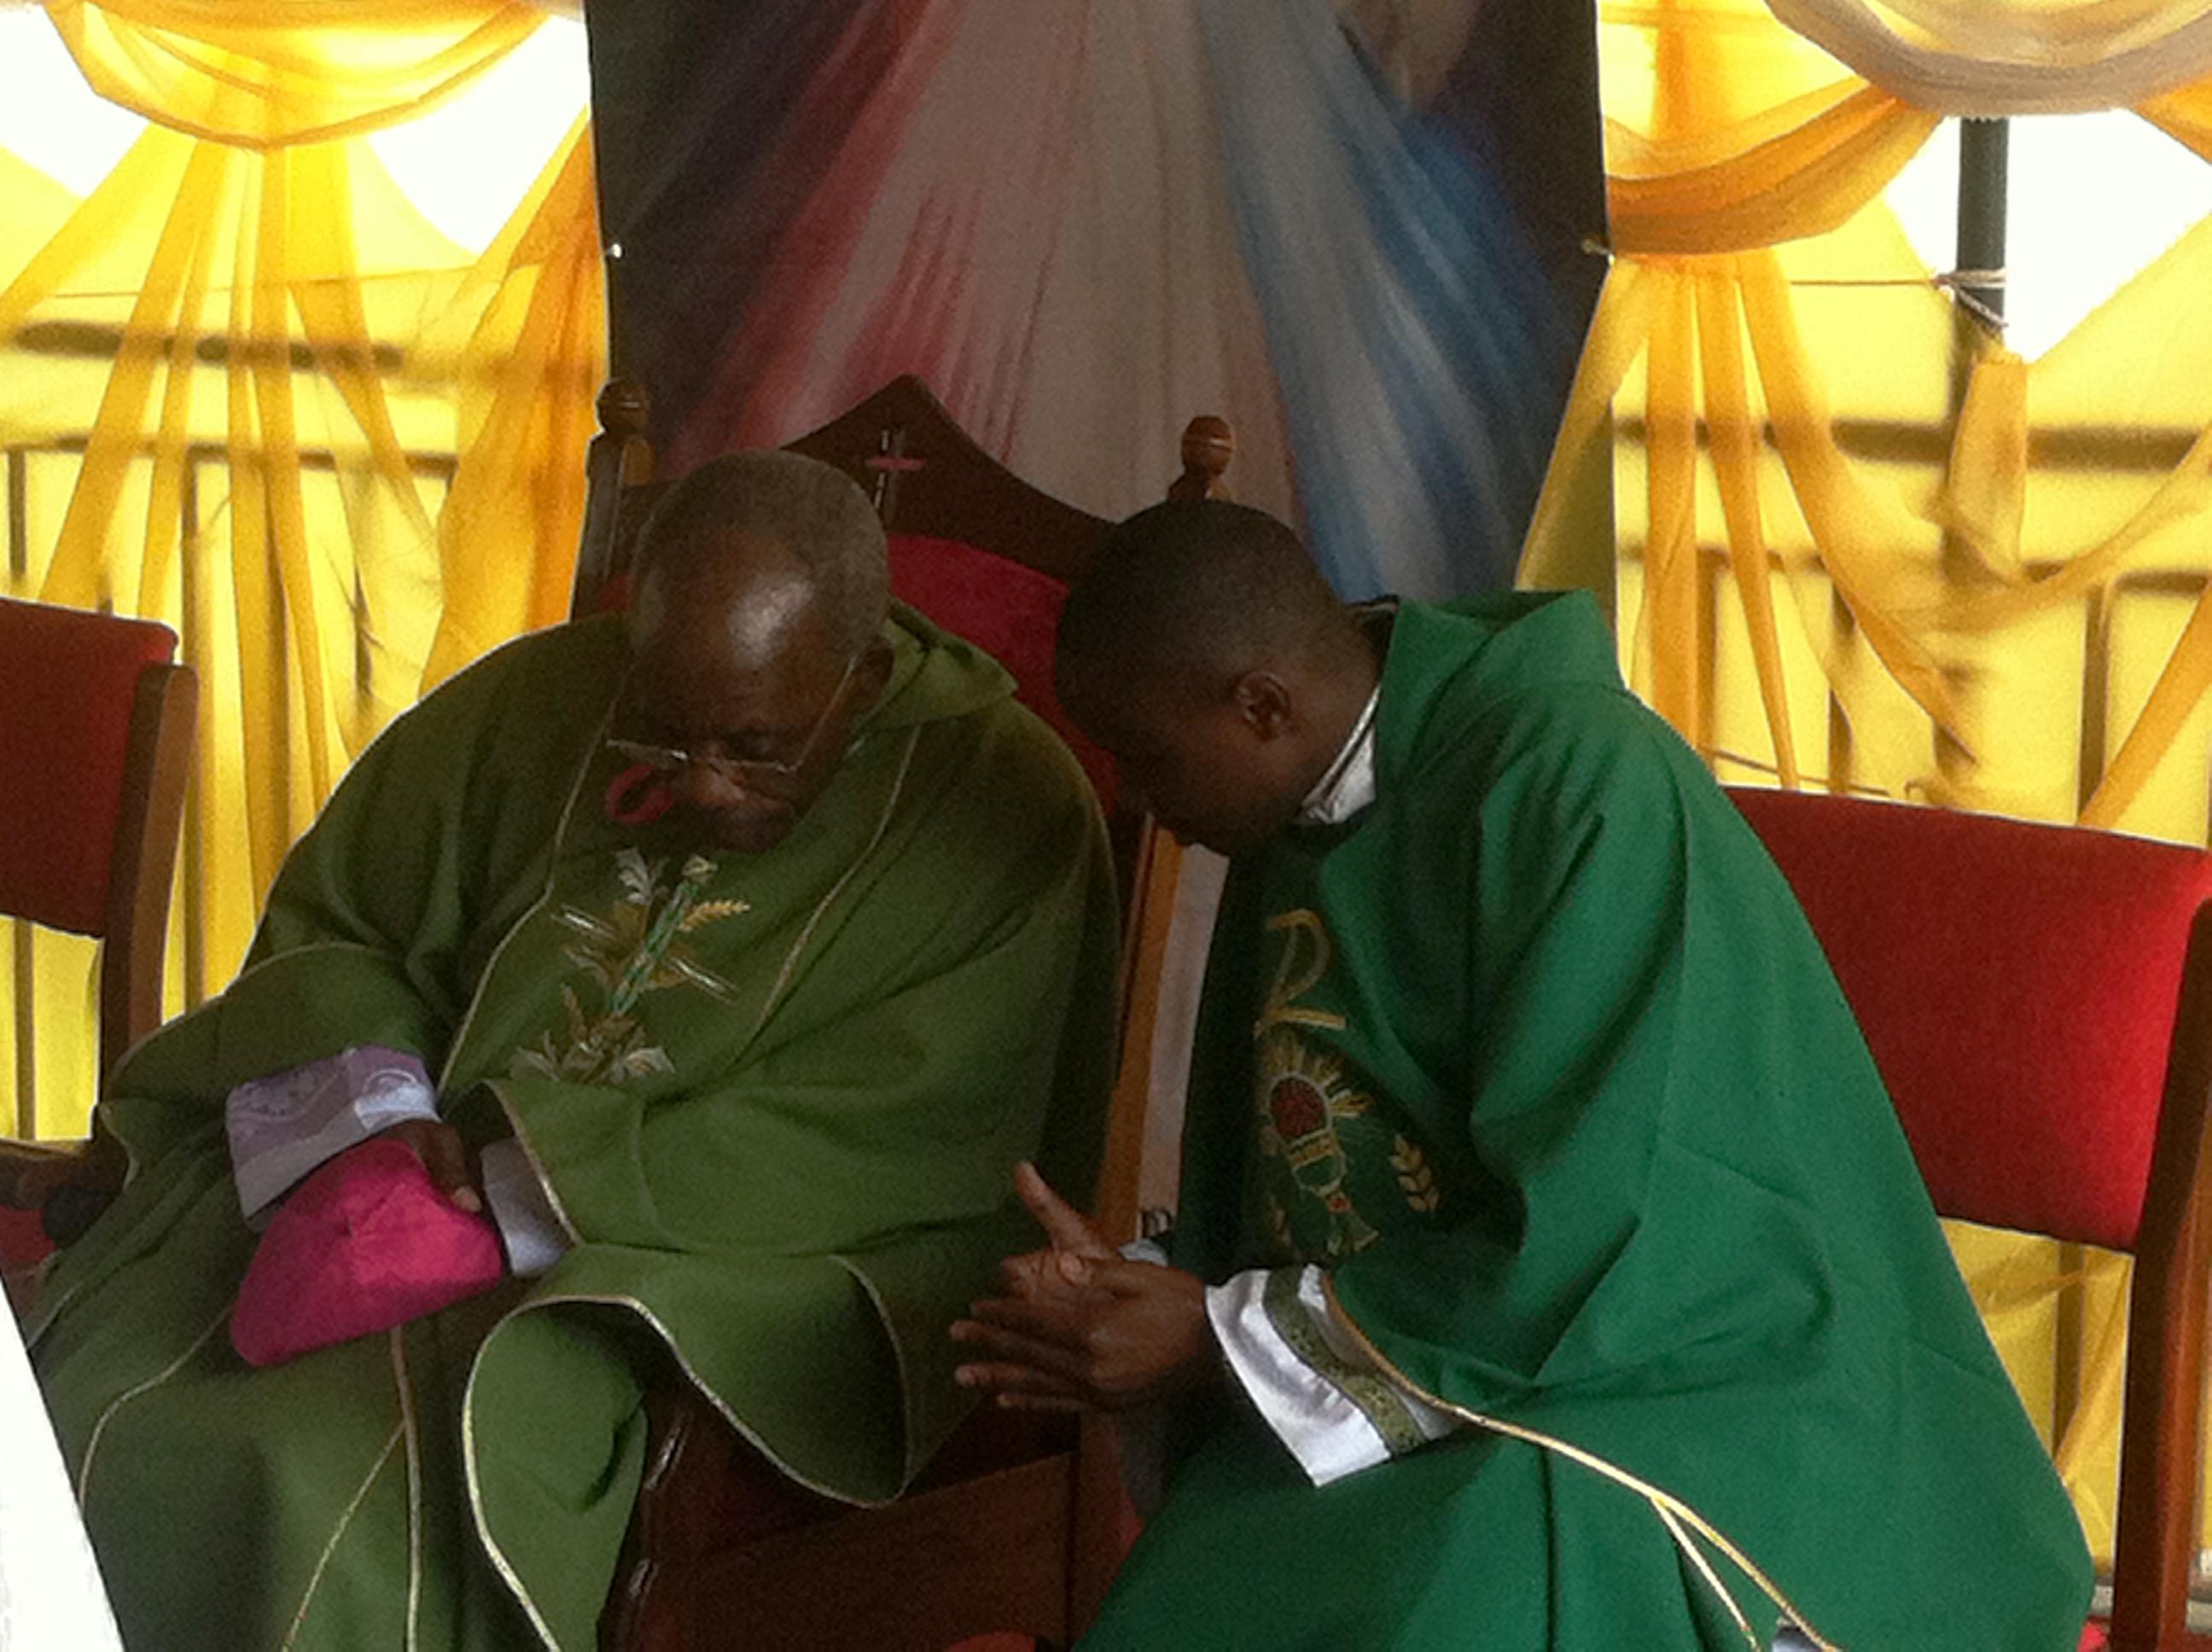 His Excellency Archbishop Kasujja leads mass-at-Kiwamirembe